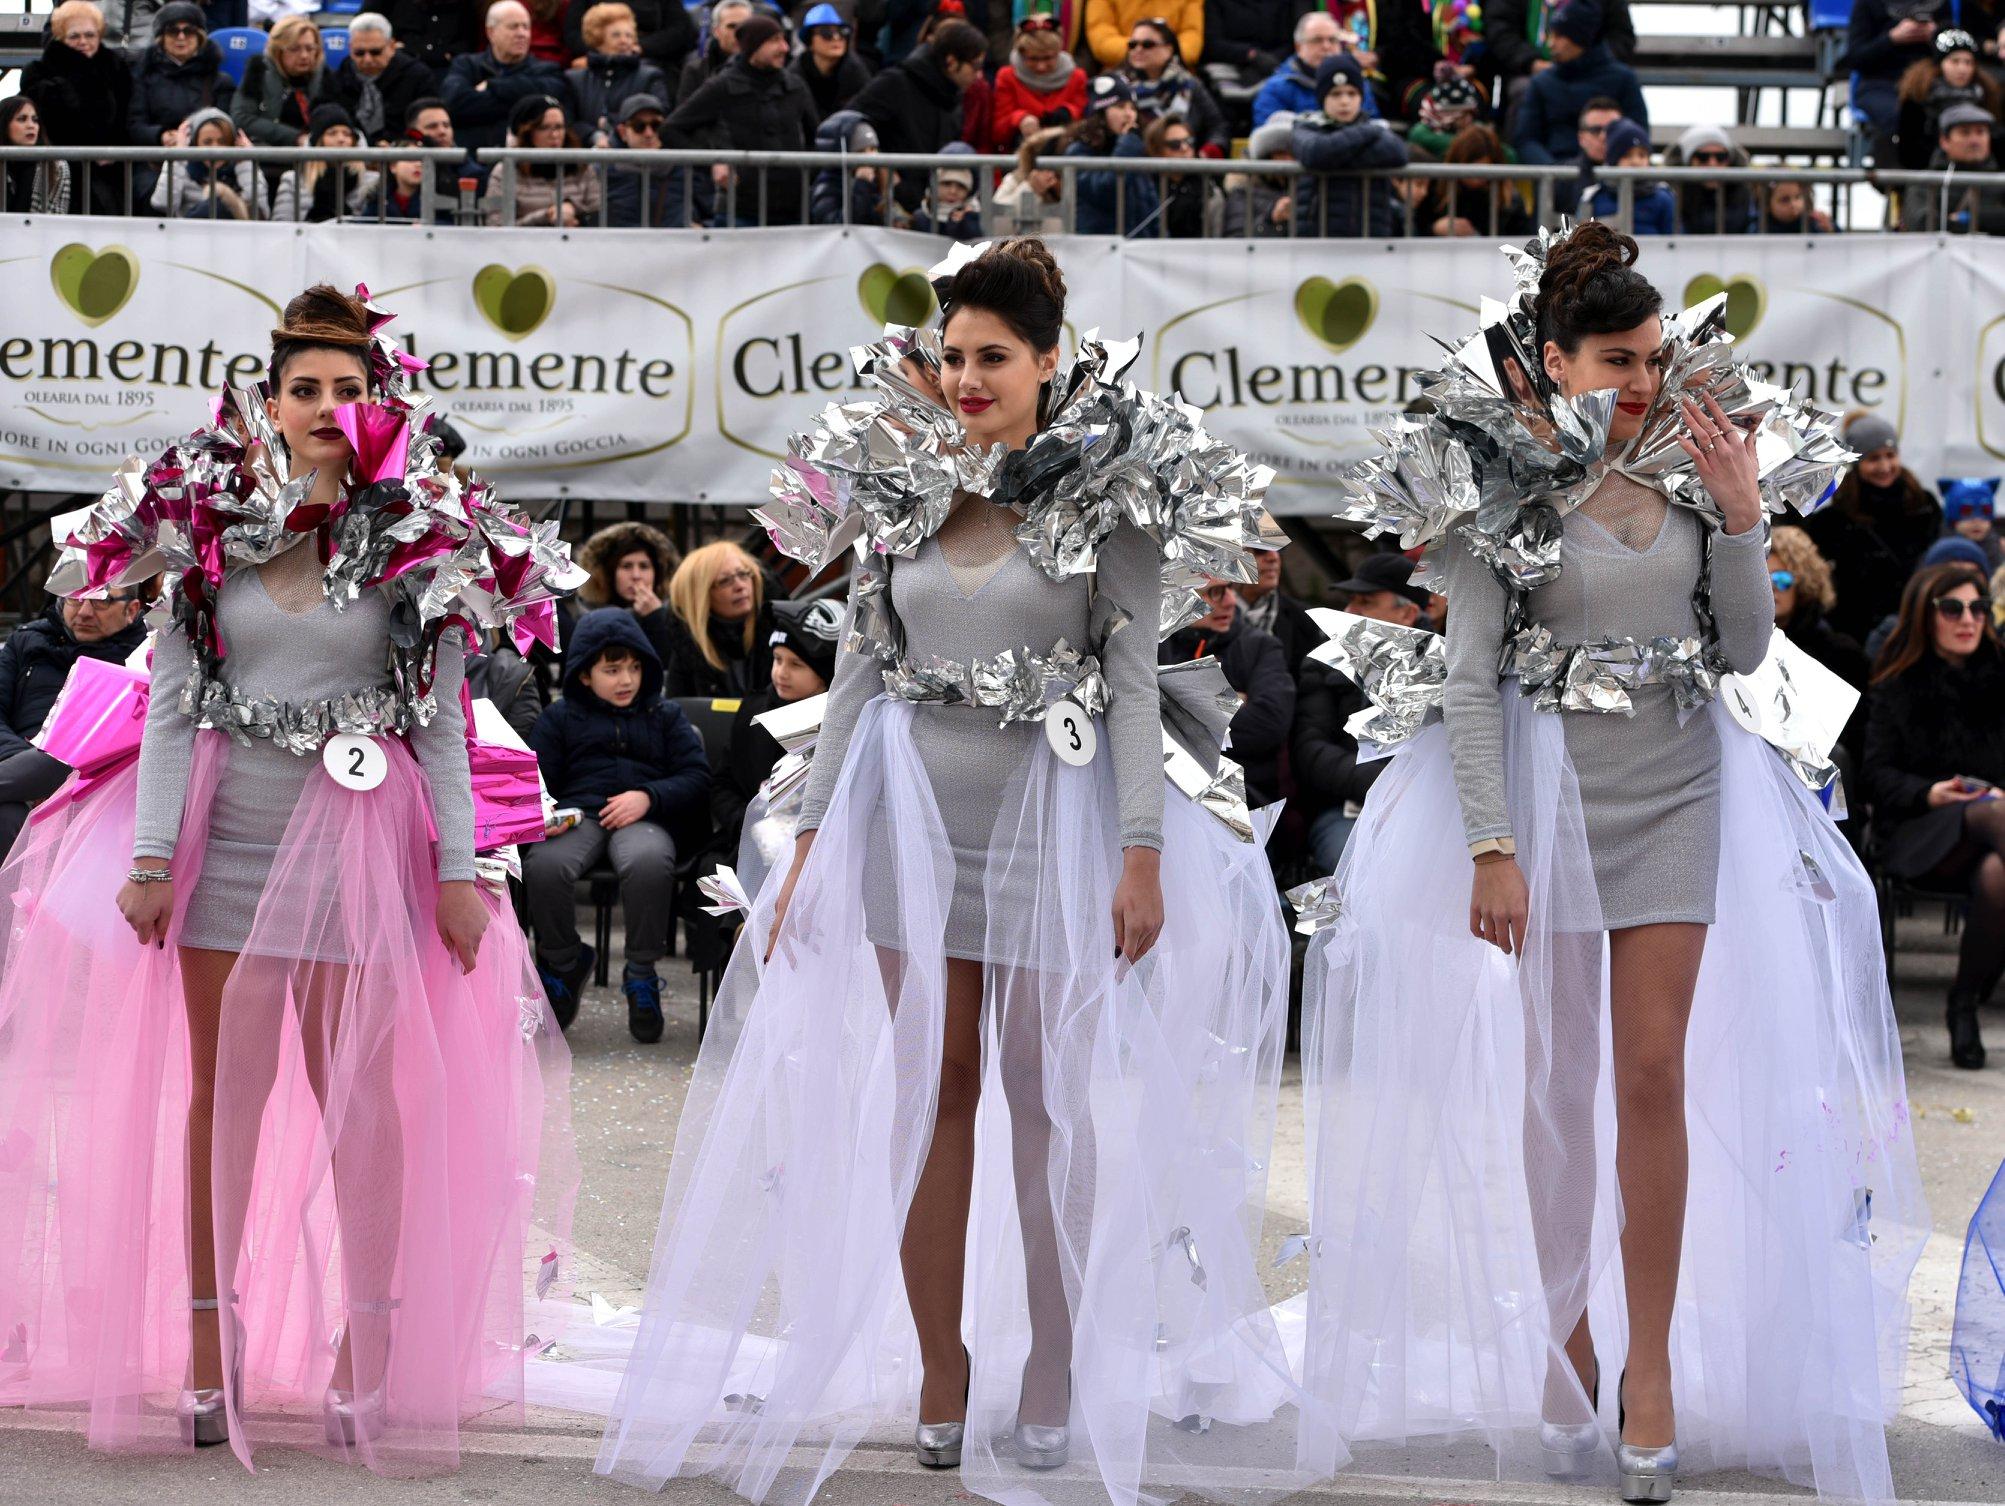 Carnevale Manfredonia 2019